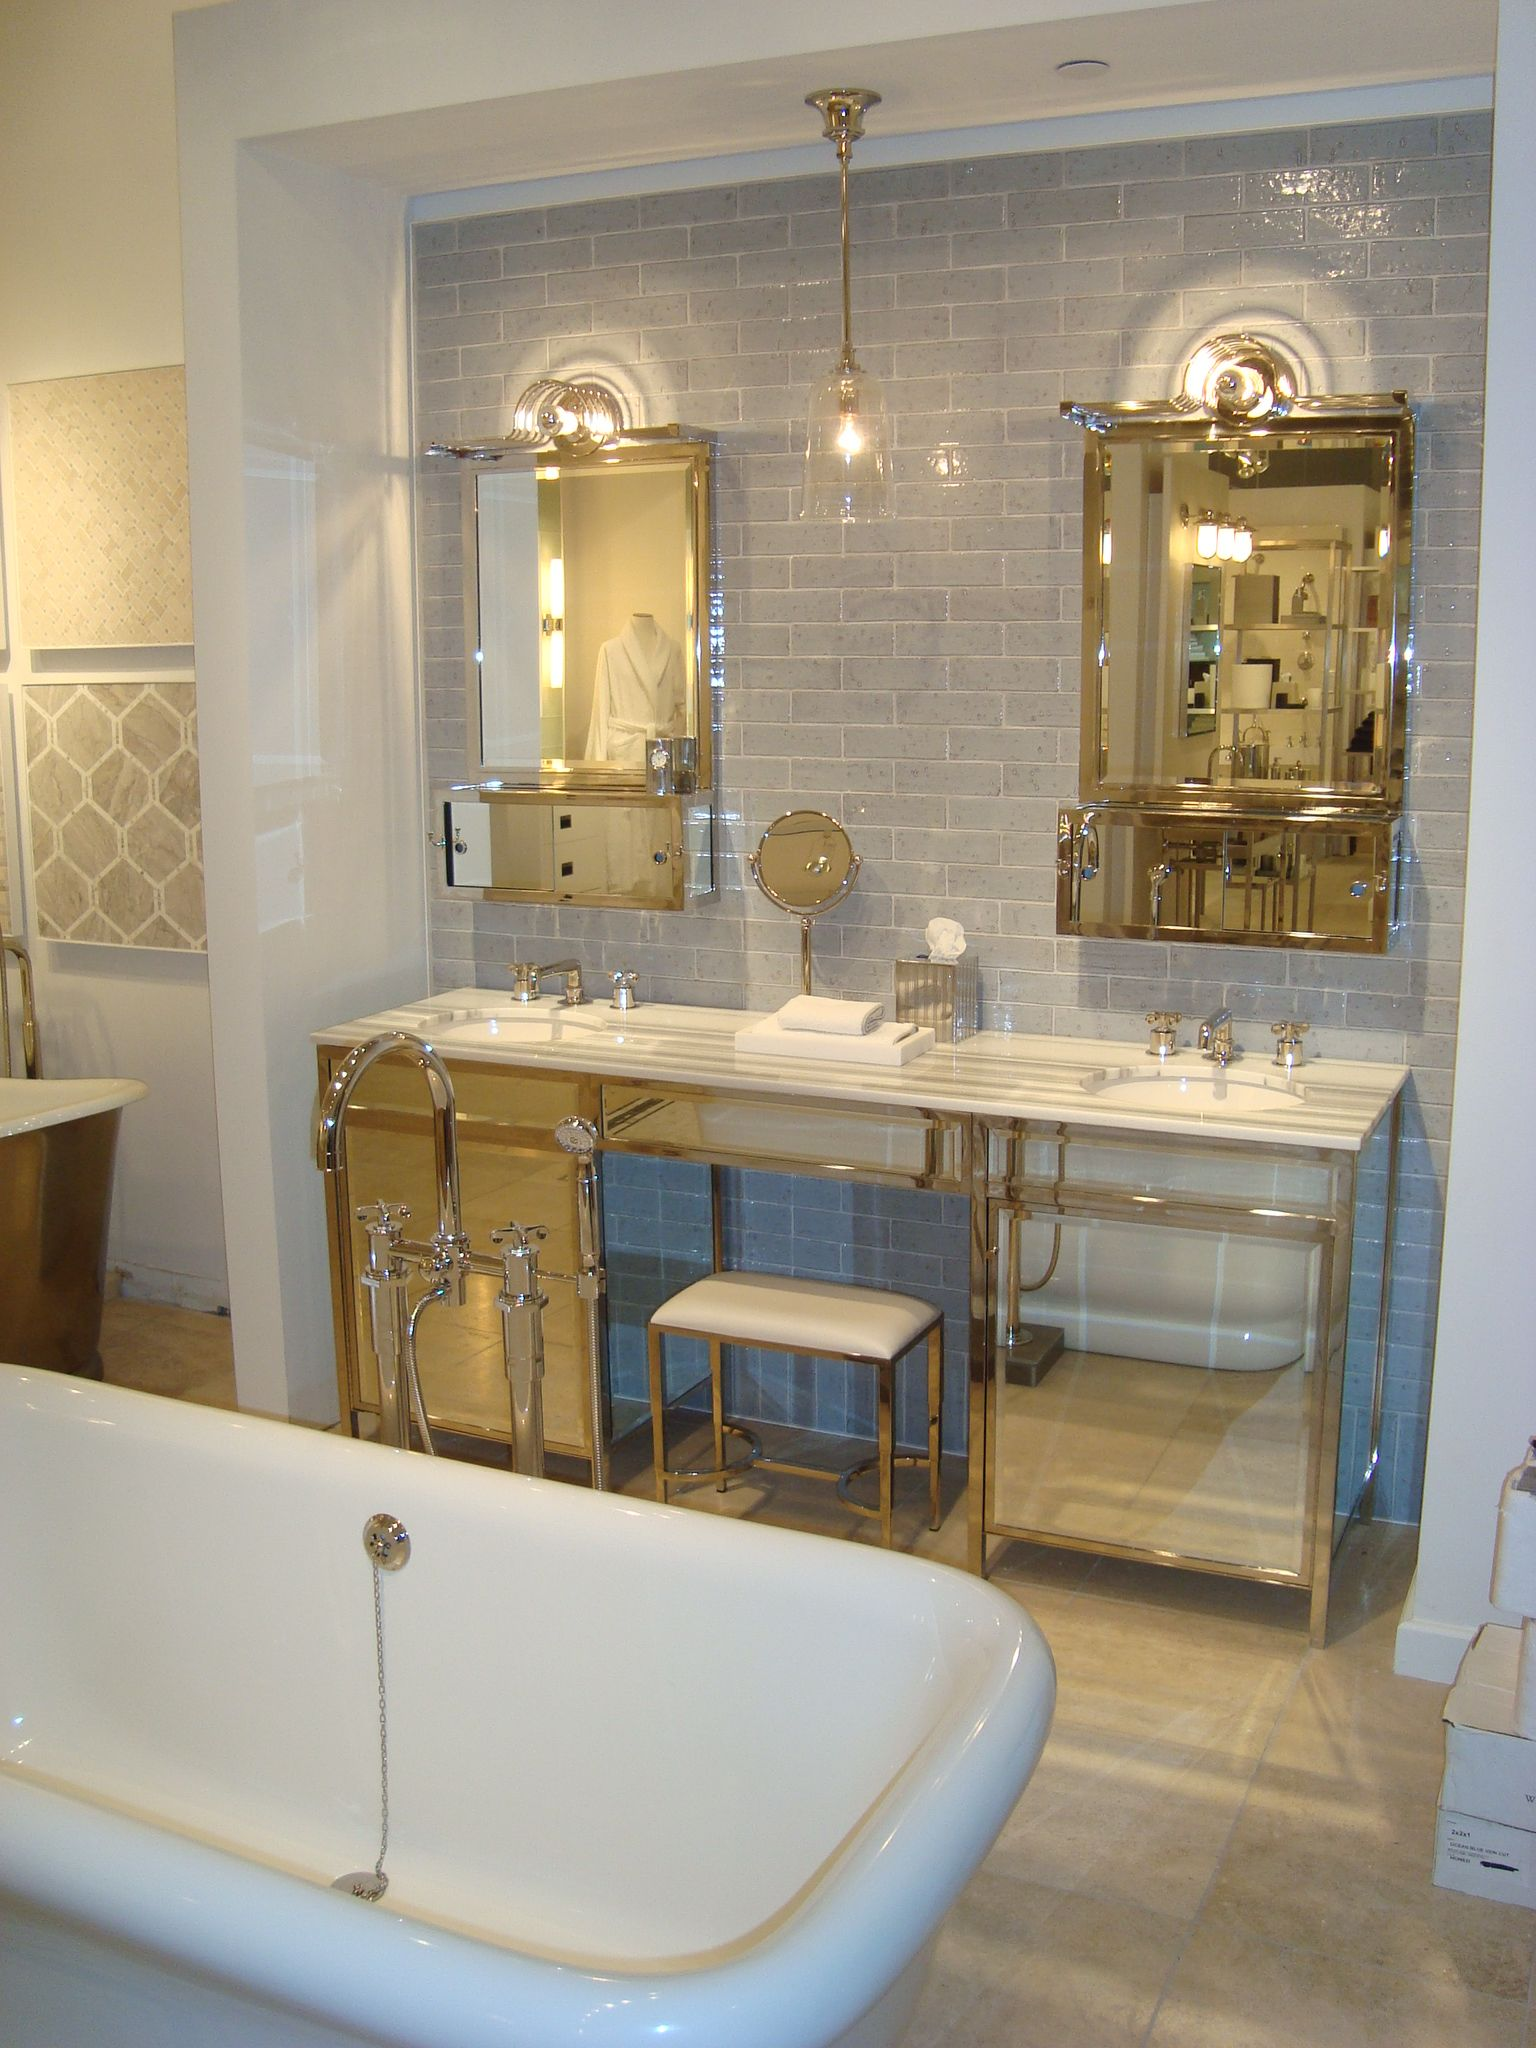 Boston Design Center Showroom Display Design Center Showroom Subway Tile Design Bathroom Interior Design